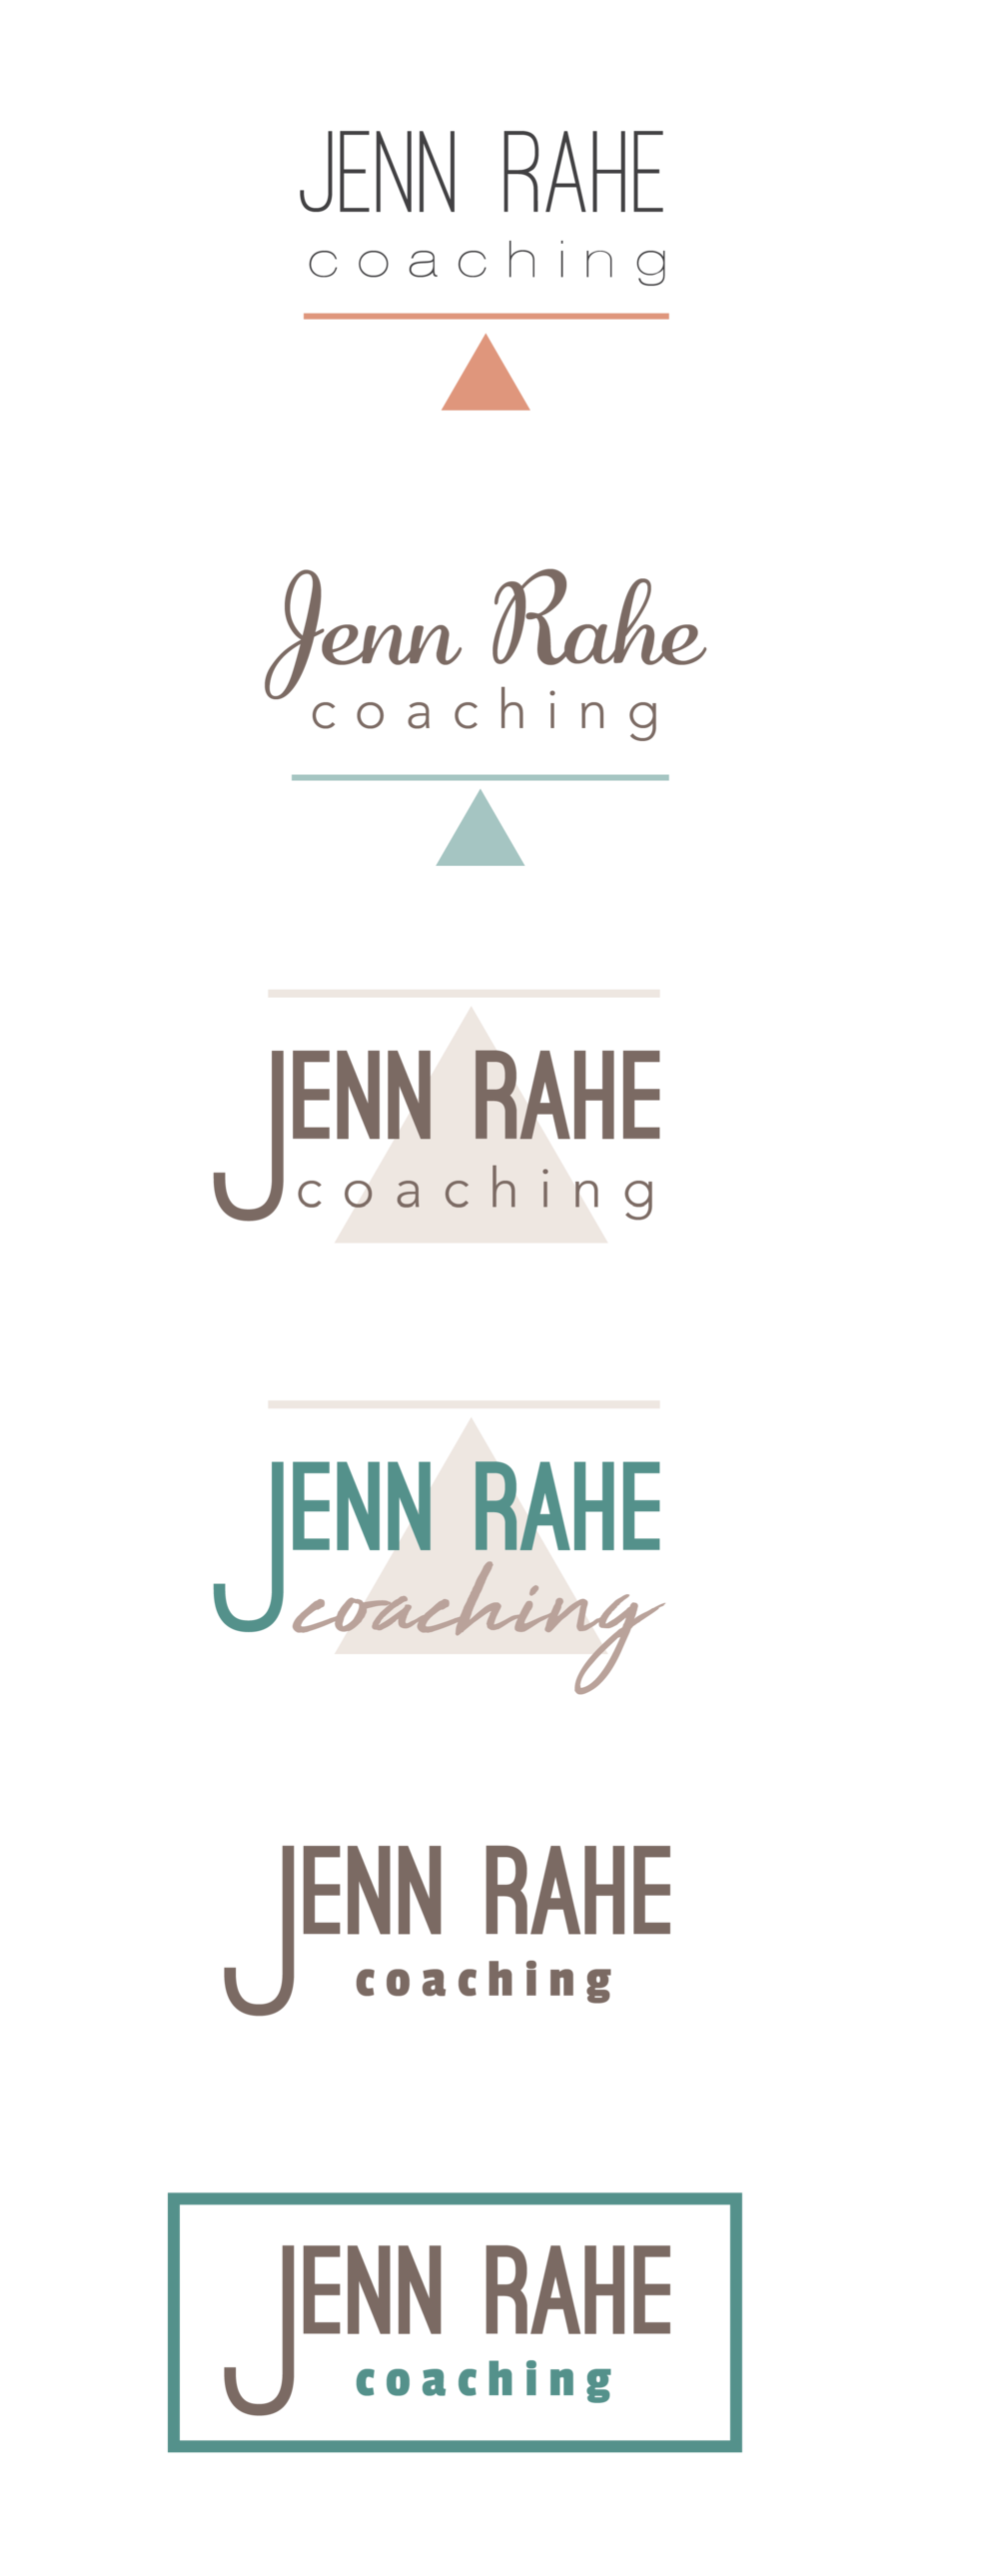 Jenn Rahe Logo concepts